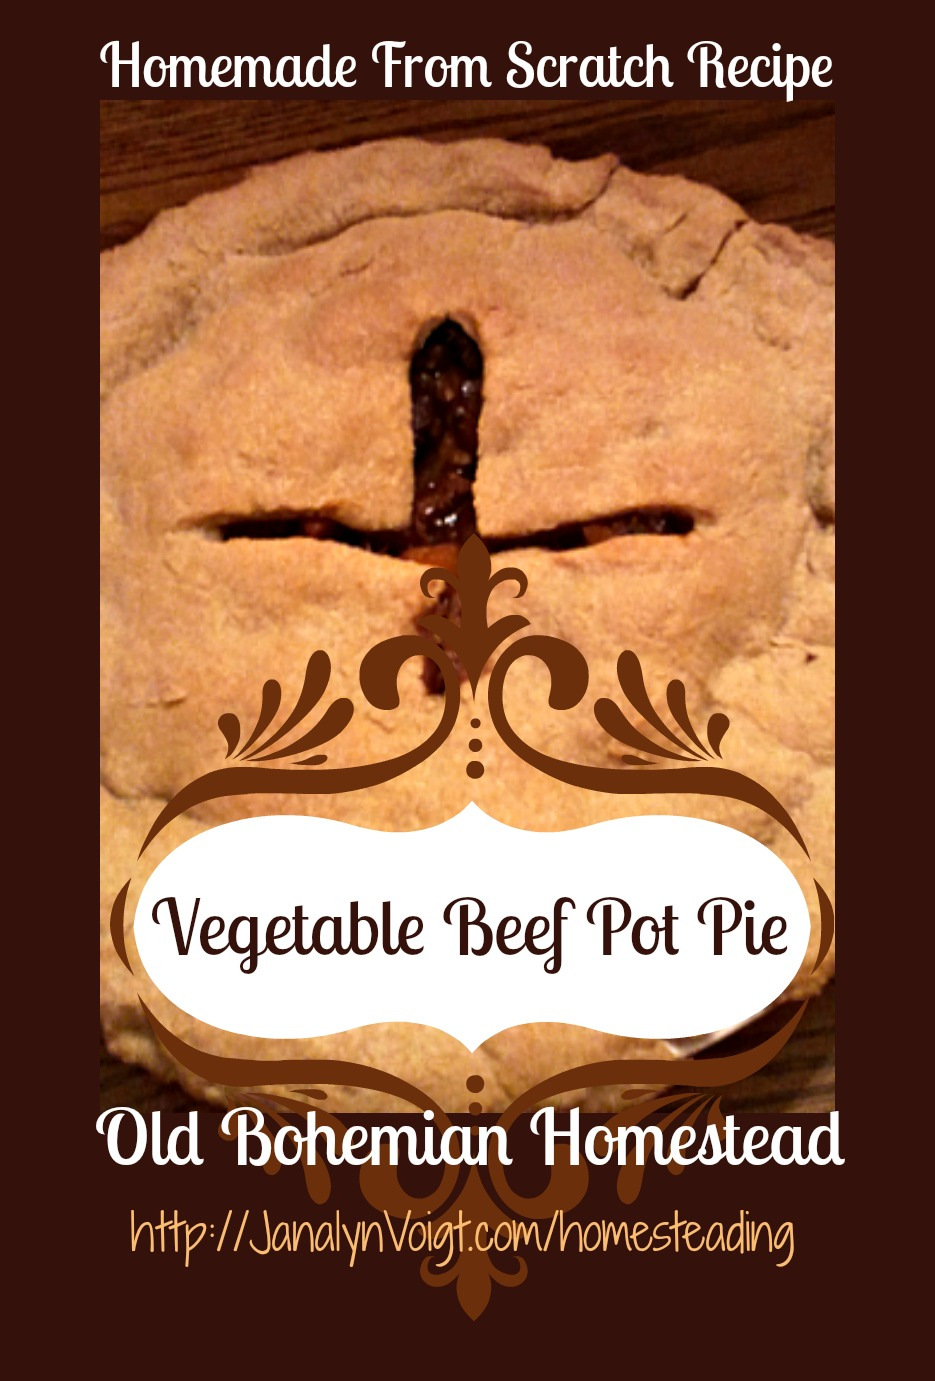 Beef Pot Pie Recipe from Janalyn Voigt   Old Bohemian Homestead